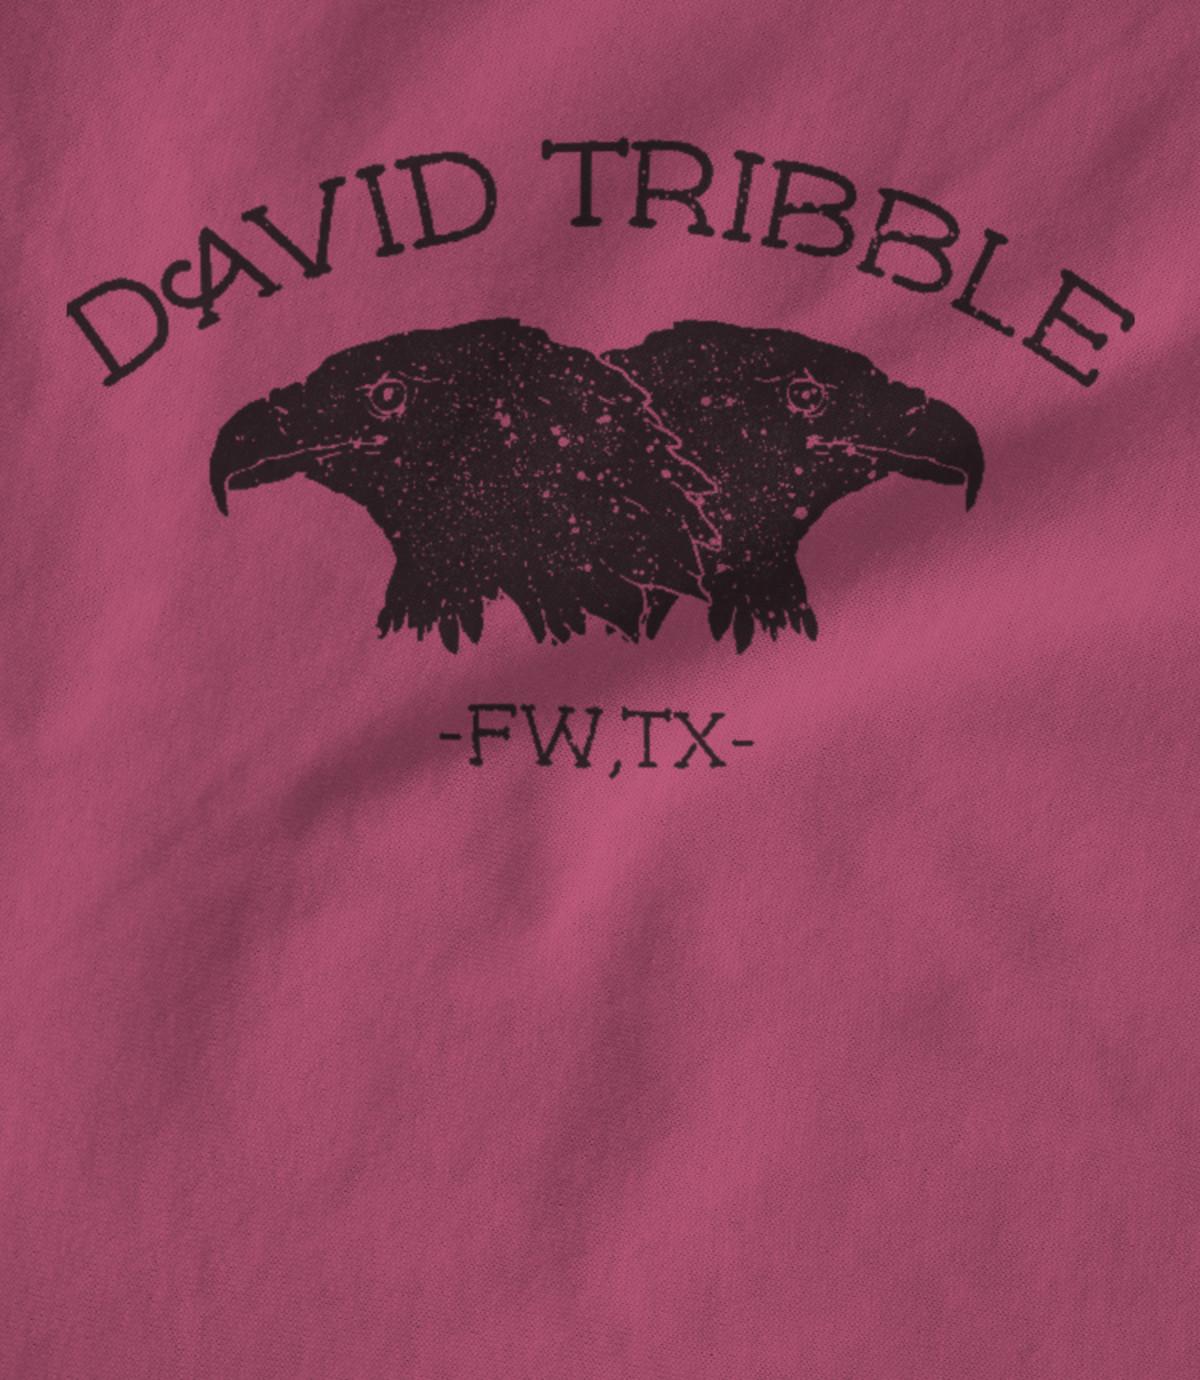 David tribble pink   crow logo t shirt 1541253498